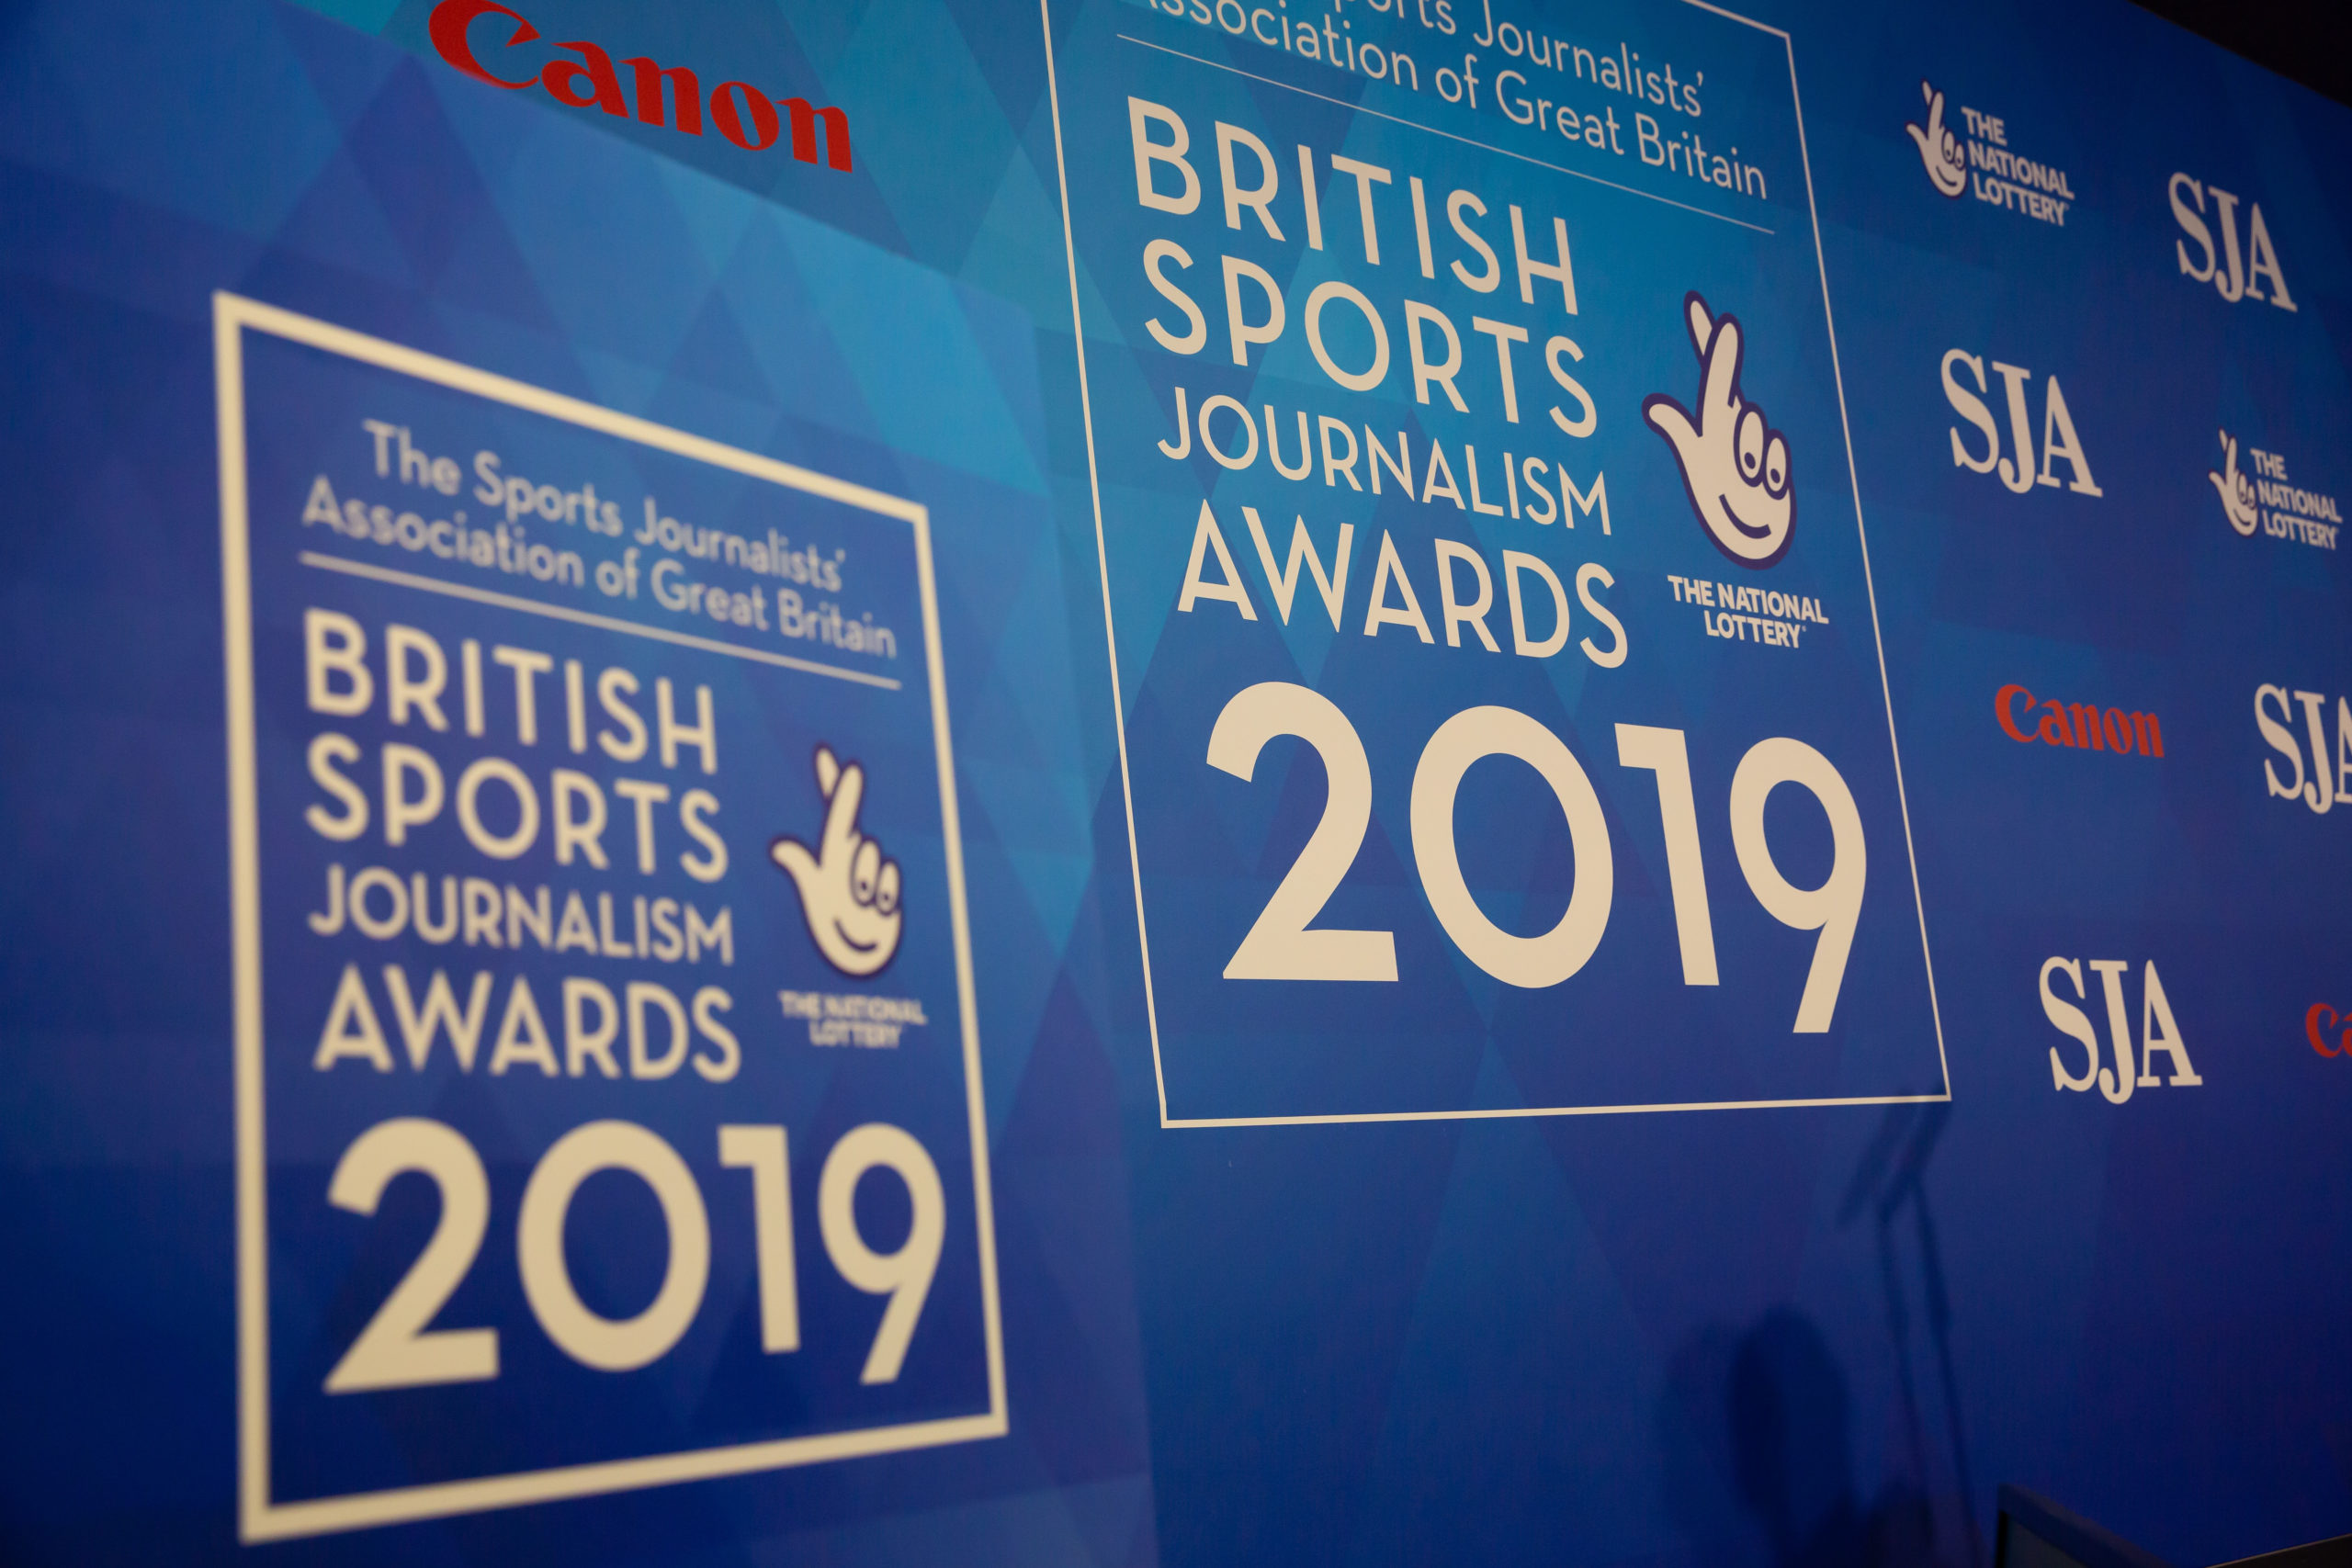 Media release: 2019 British Sports Journalism Awards winners